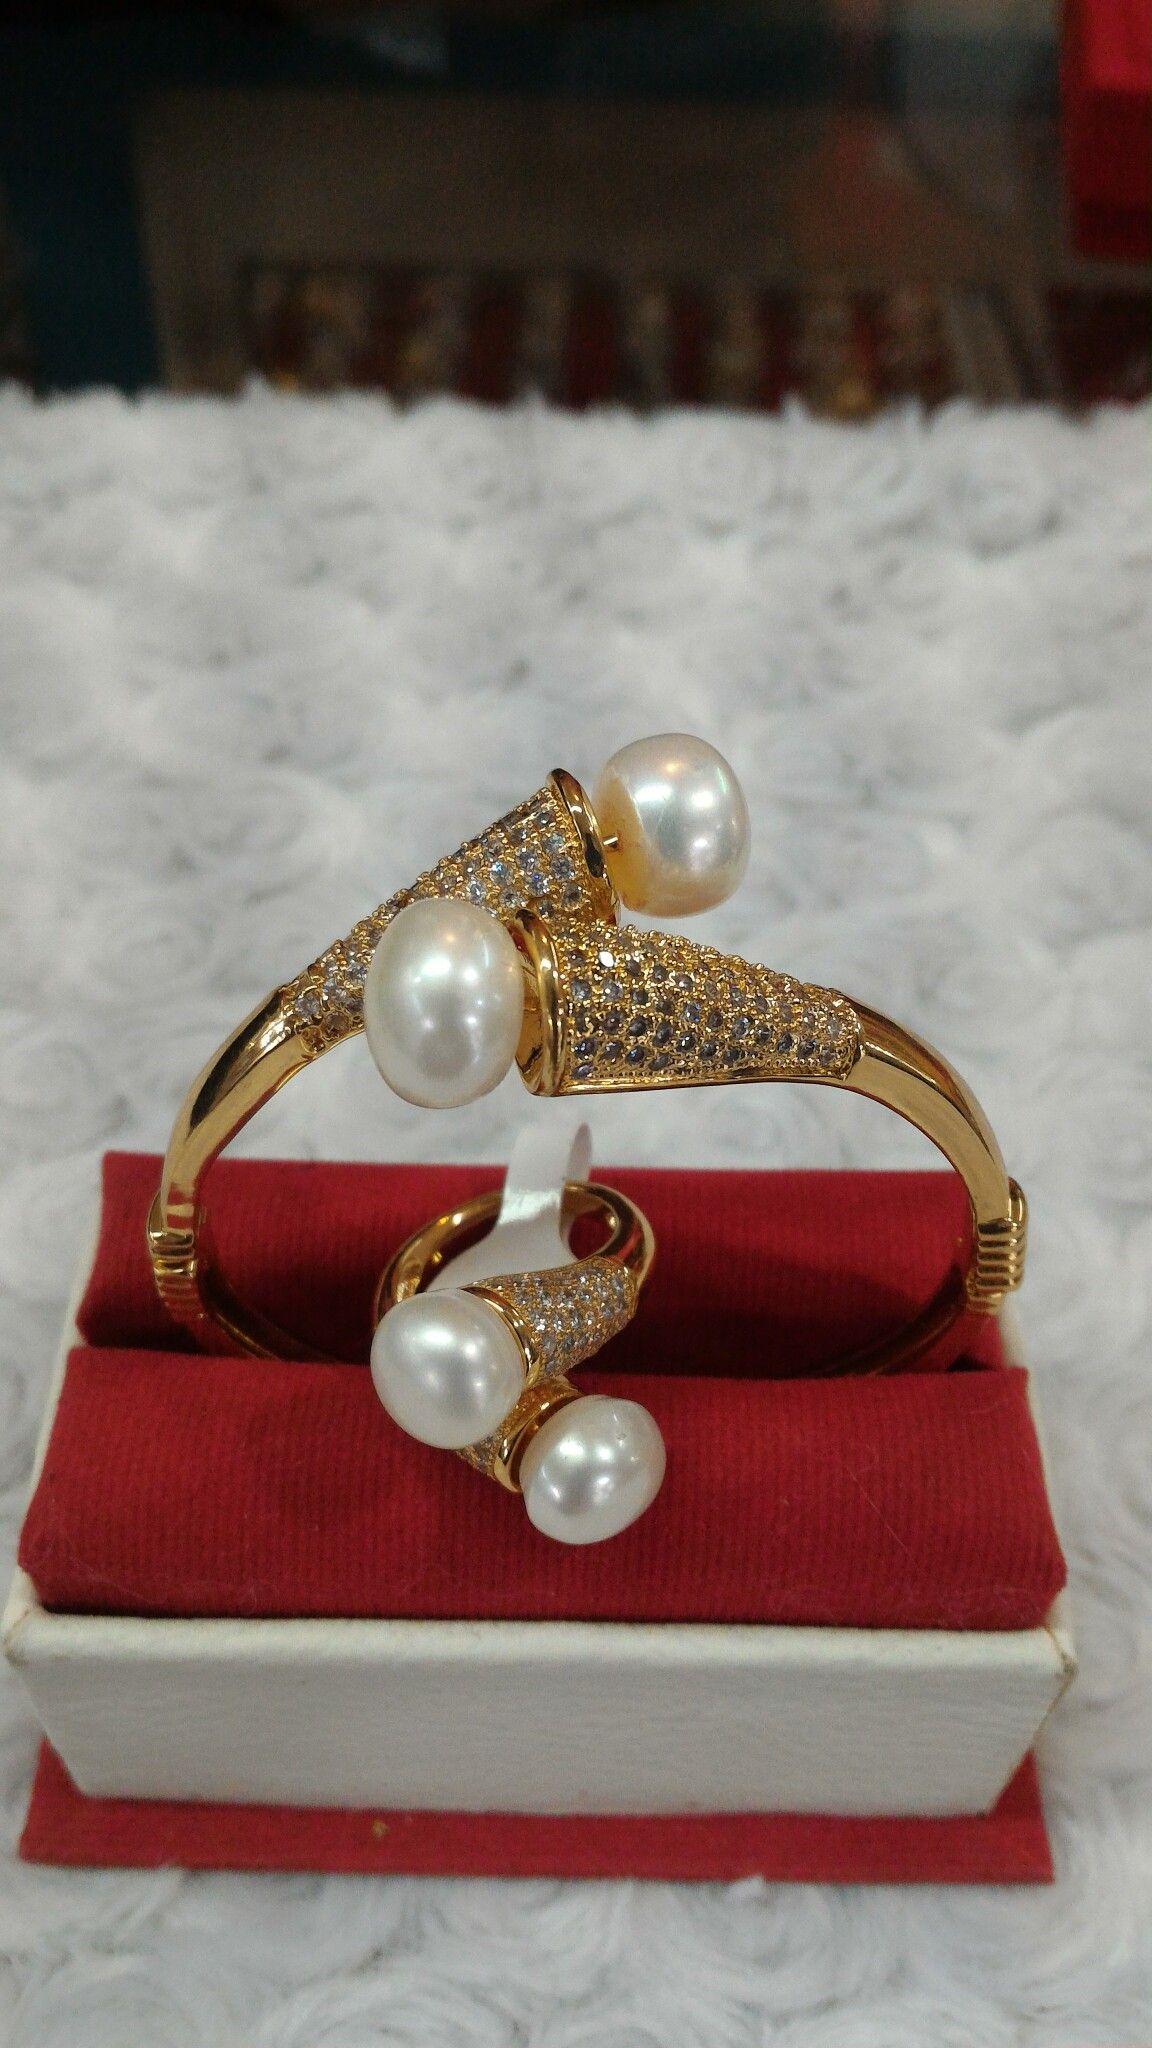 Minat Invite Pin Bb 5f2b92ea Atau No Wa 081917256622 Google 1 Set Perhiasan Rhodium Shop Lombok